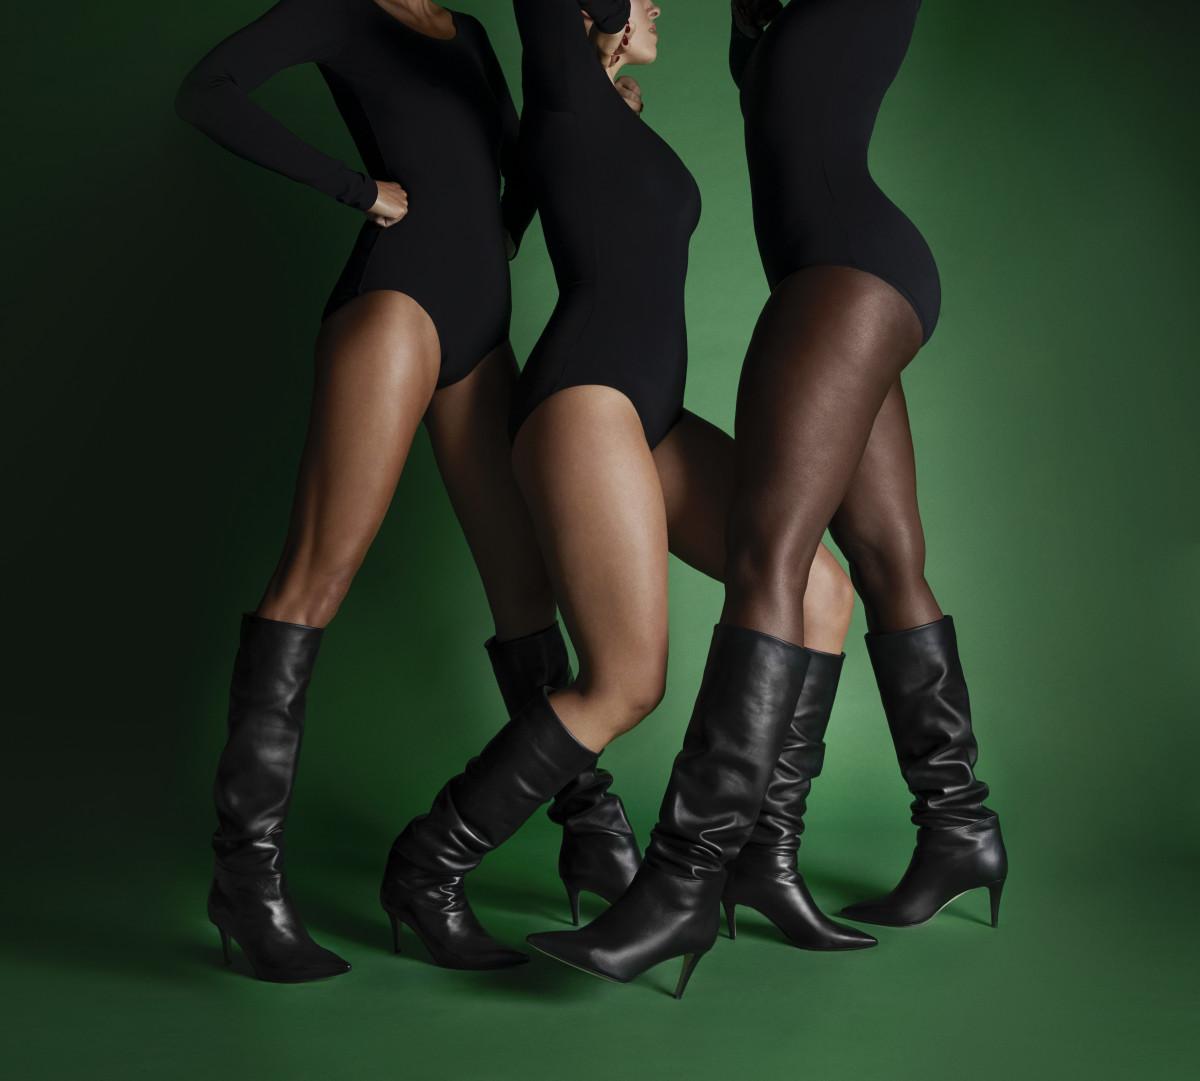 An image from Tamara Mellon's New Icons campaign. Photo: Courtesy of Tamara Mellon